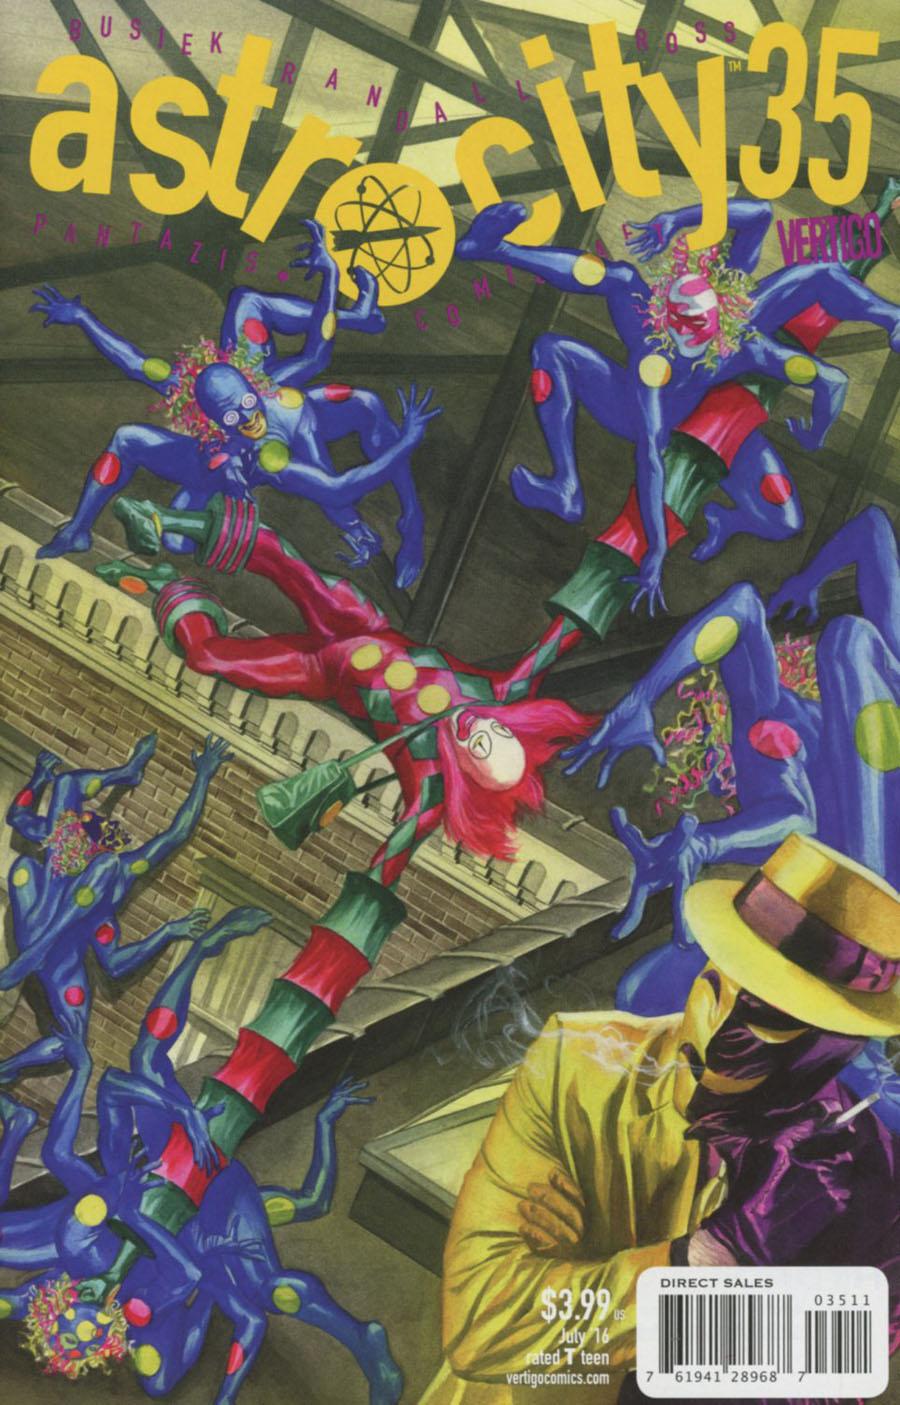 Astro City Vol 3 #35